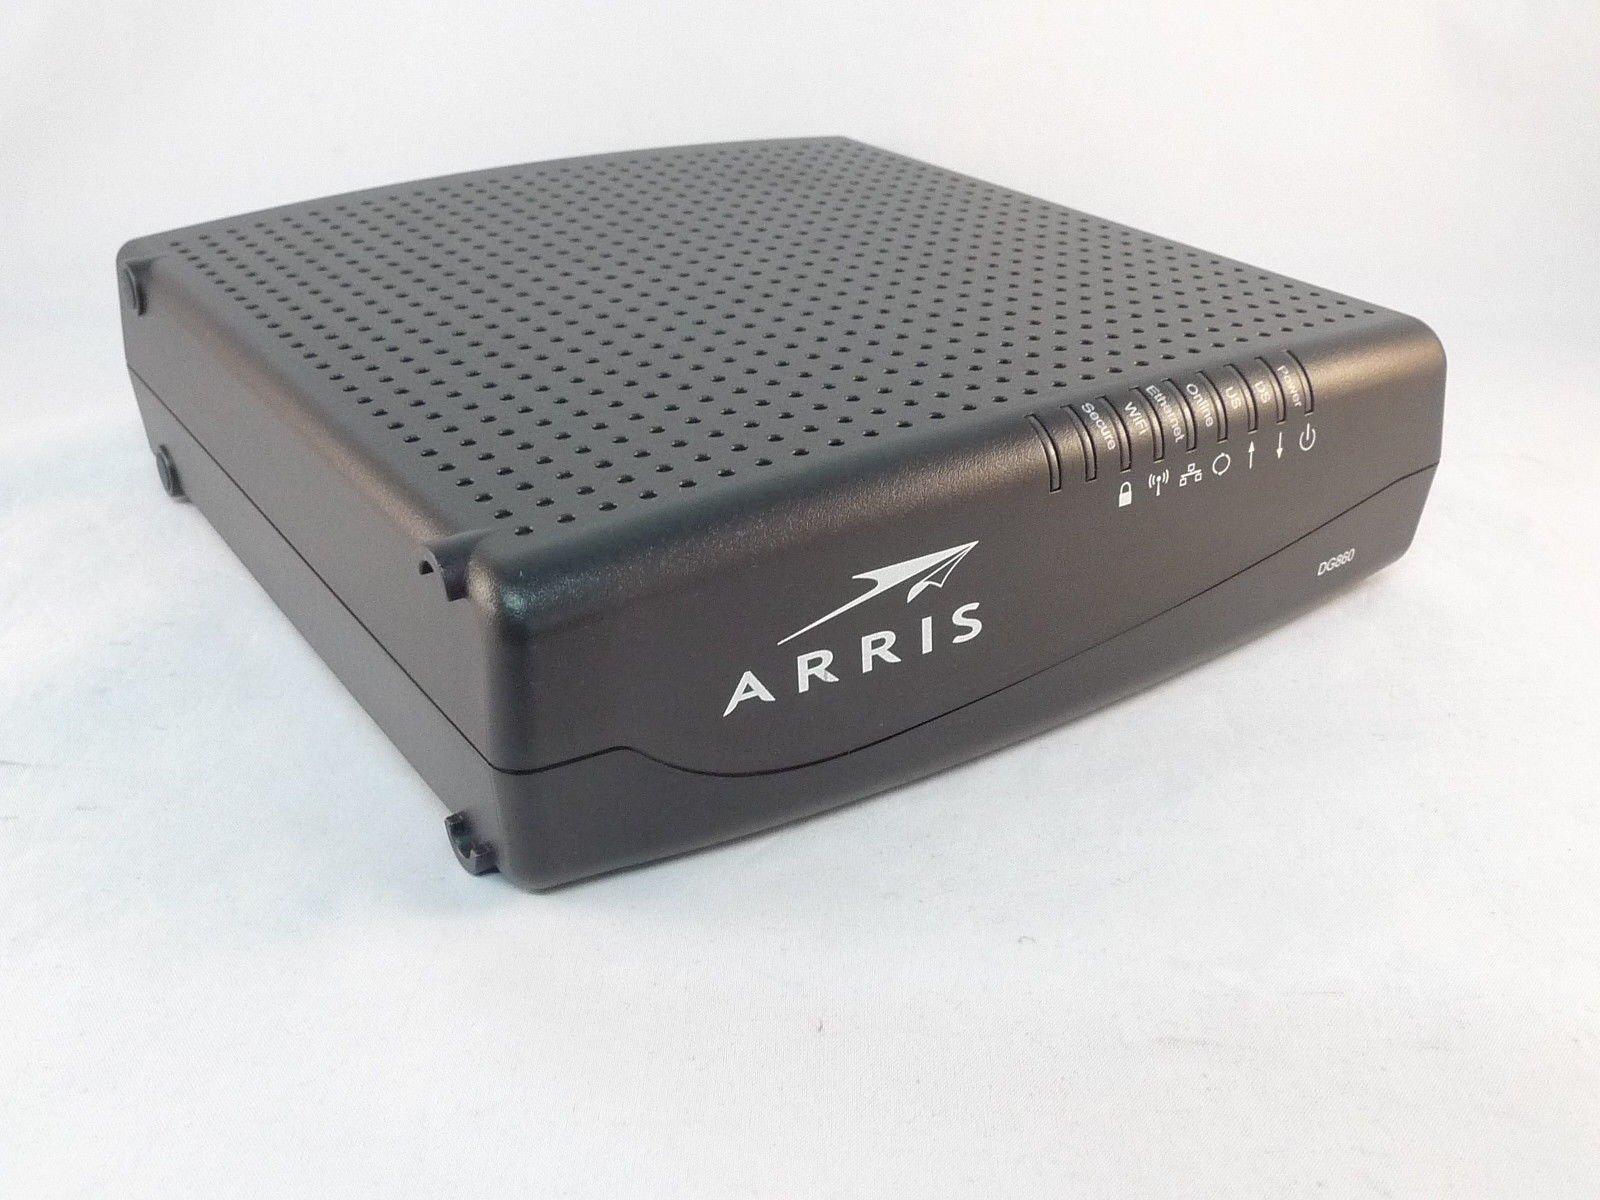 Arris Dg860a Docsis 3.0 Cable Modem Wireless Router Gateway by Unknown